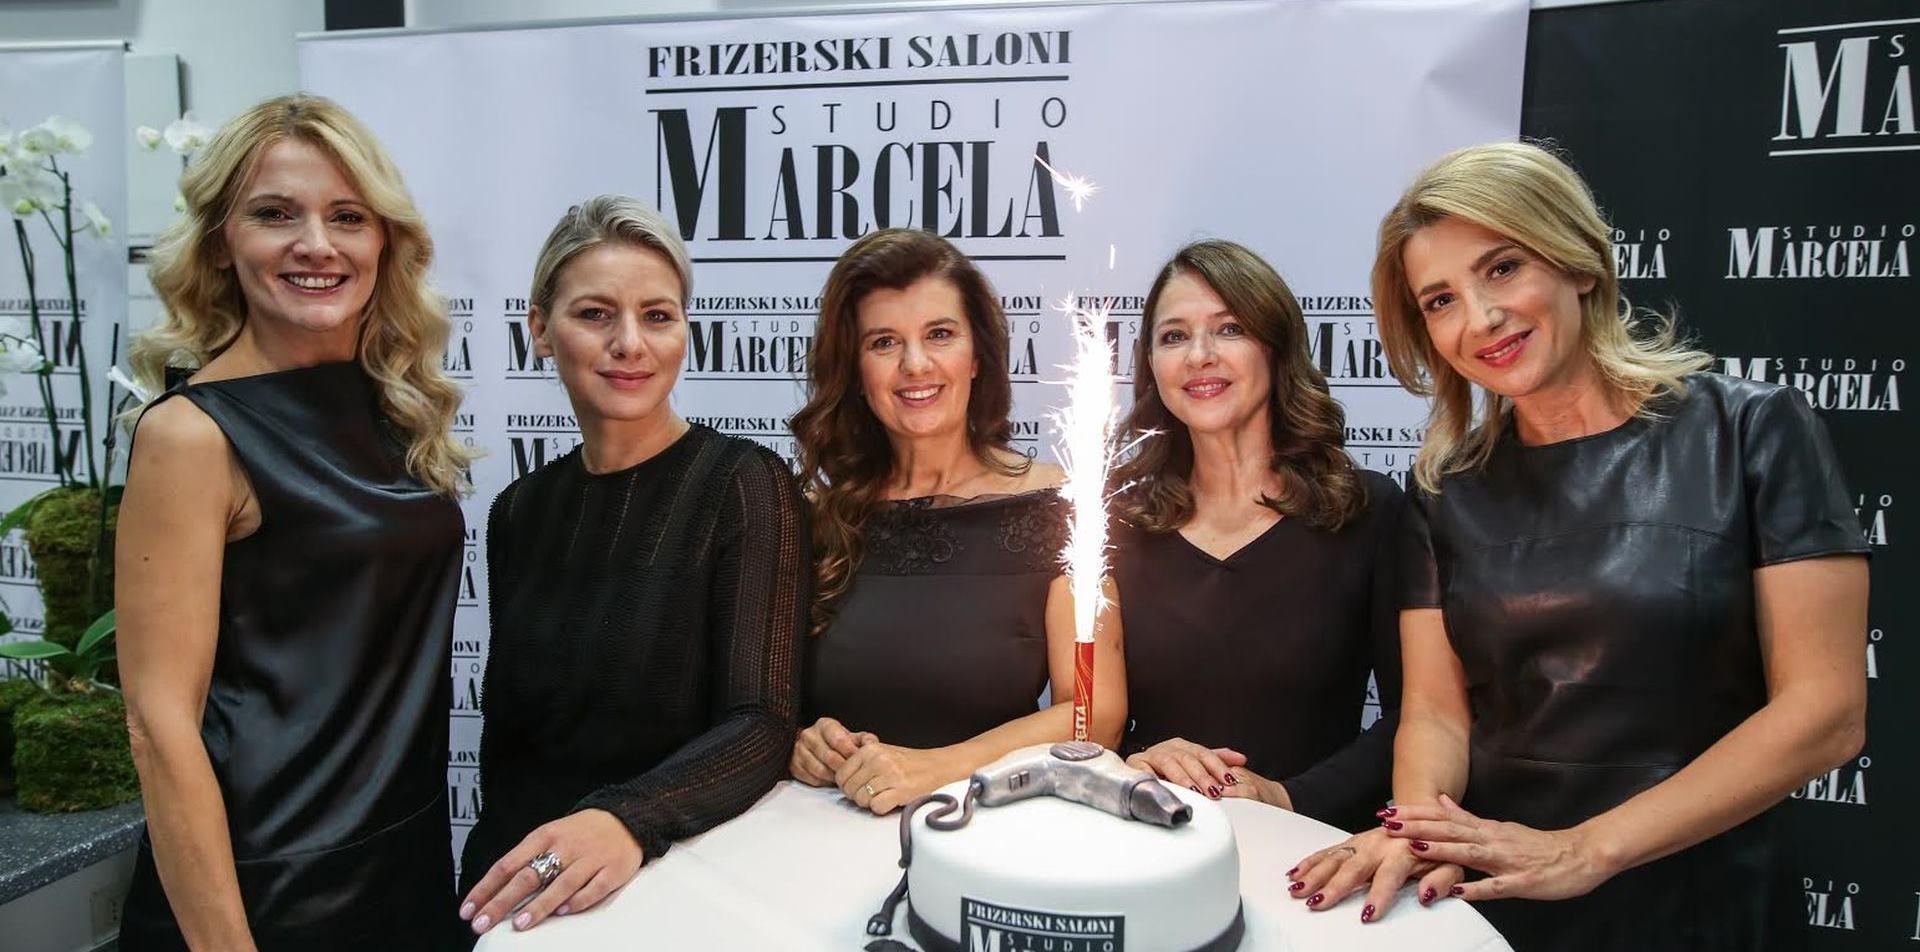 FOTO: Lanac frizerskih salona Studio Marcela proslavio rođendan